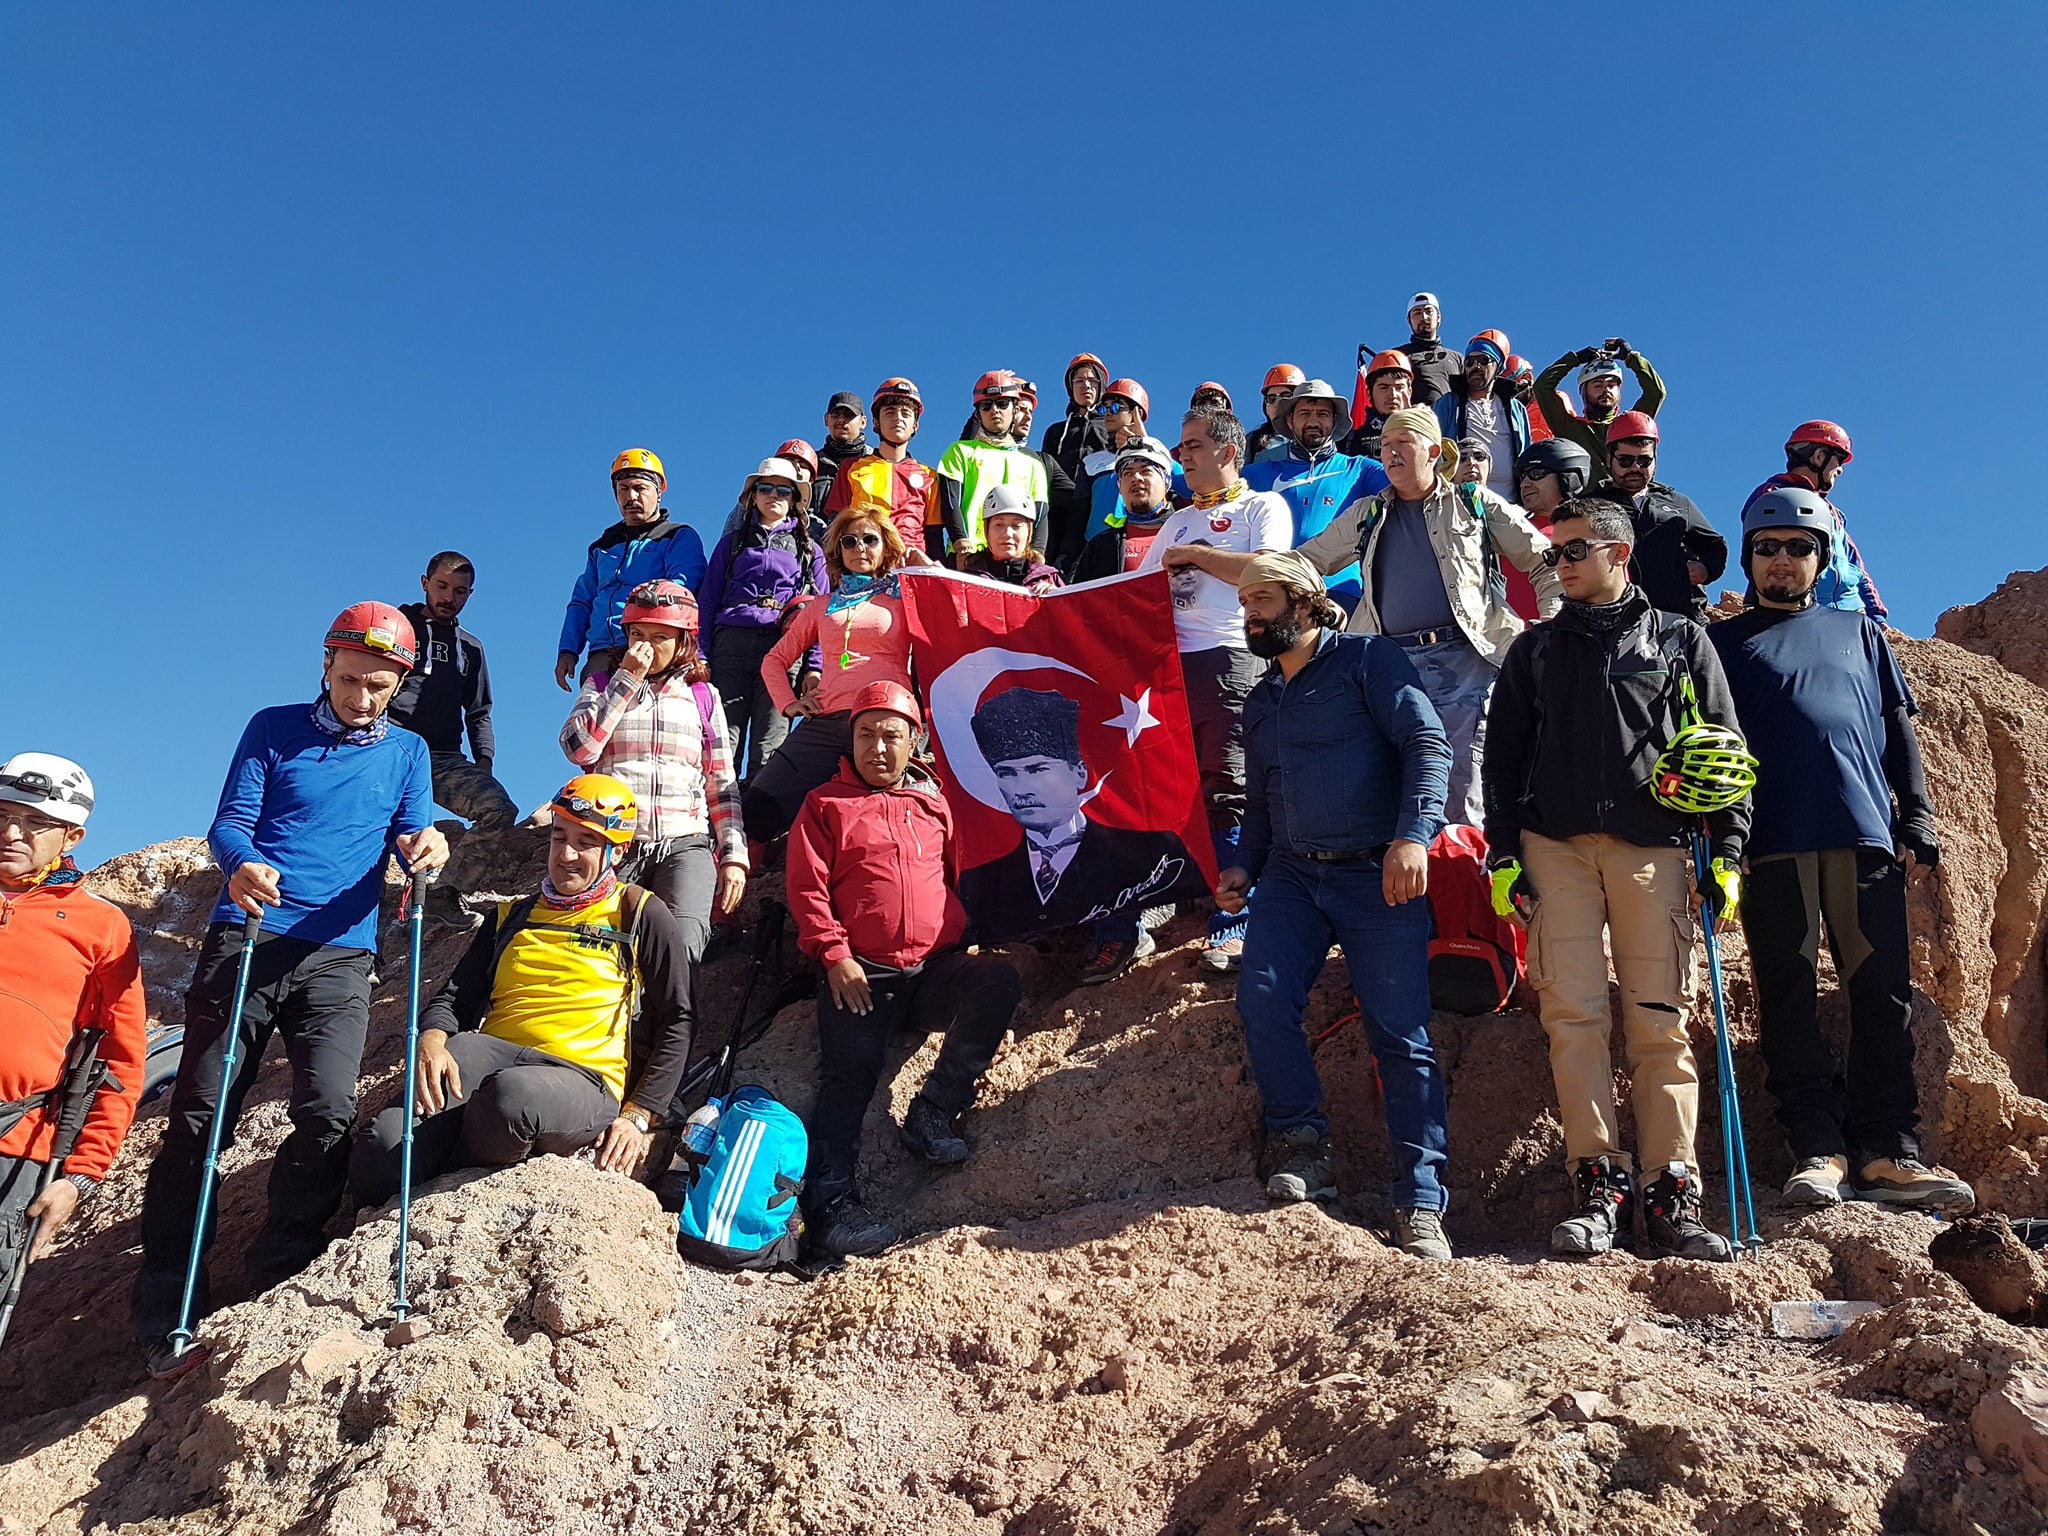 30 Ağustos Zafer Tırmanışı